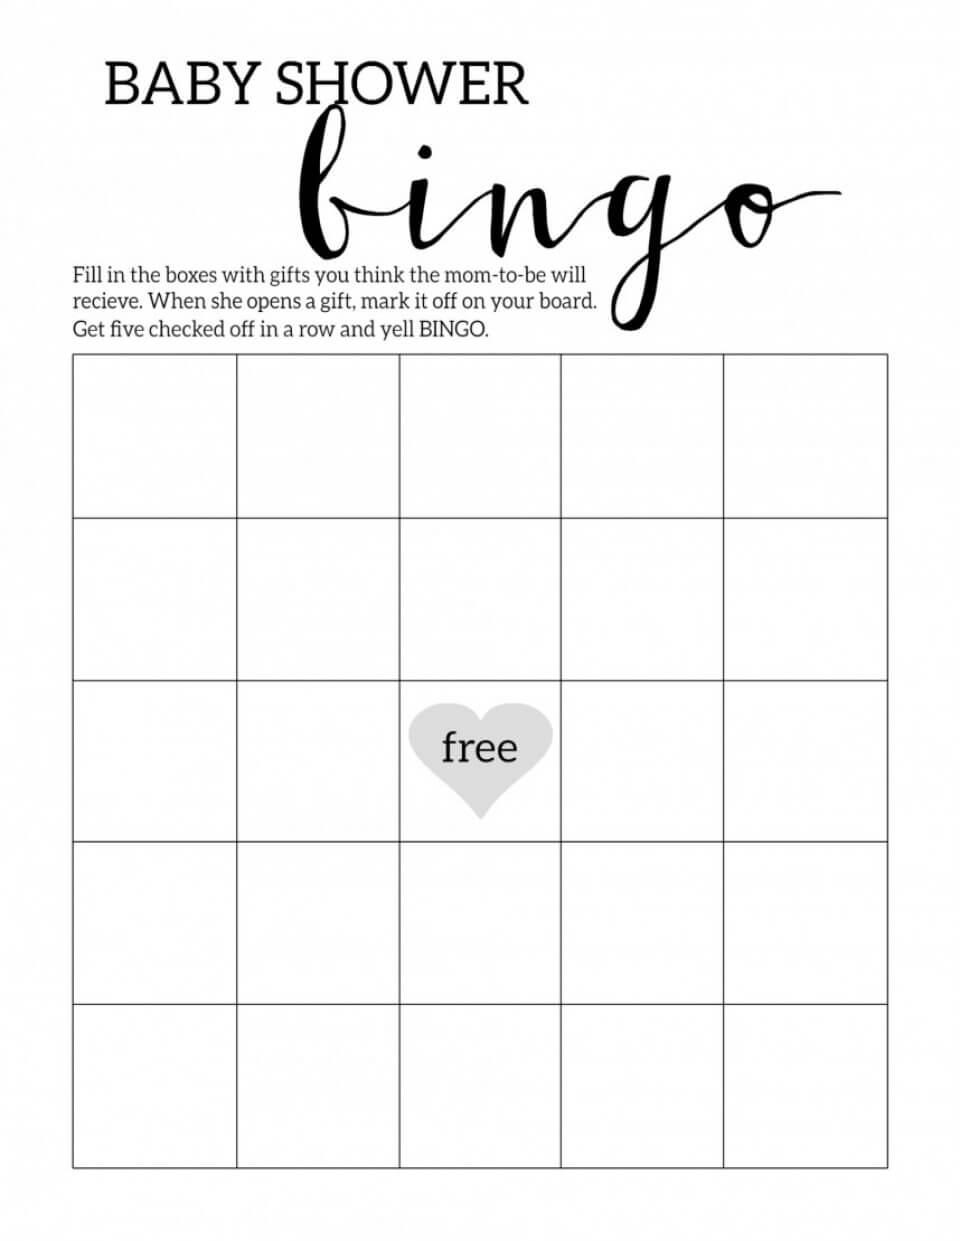 034 Template Ideas Blank Bingo Card Stirring 4X4 Excel Inside Blank Bingo Card Template Microsoft Word